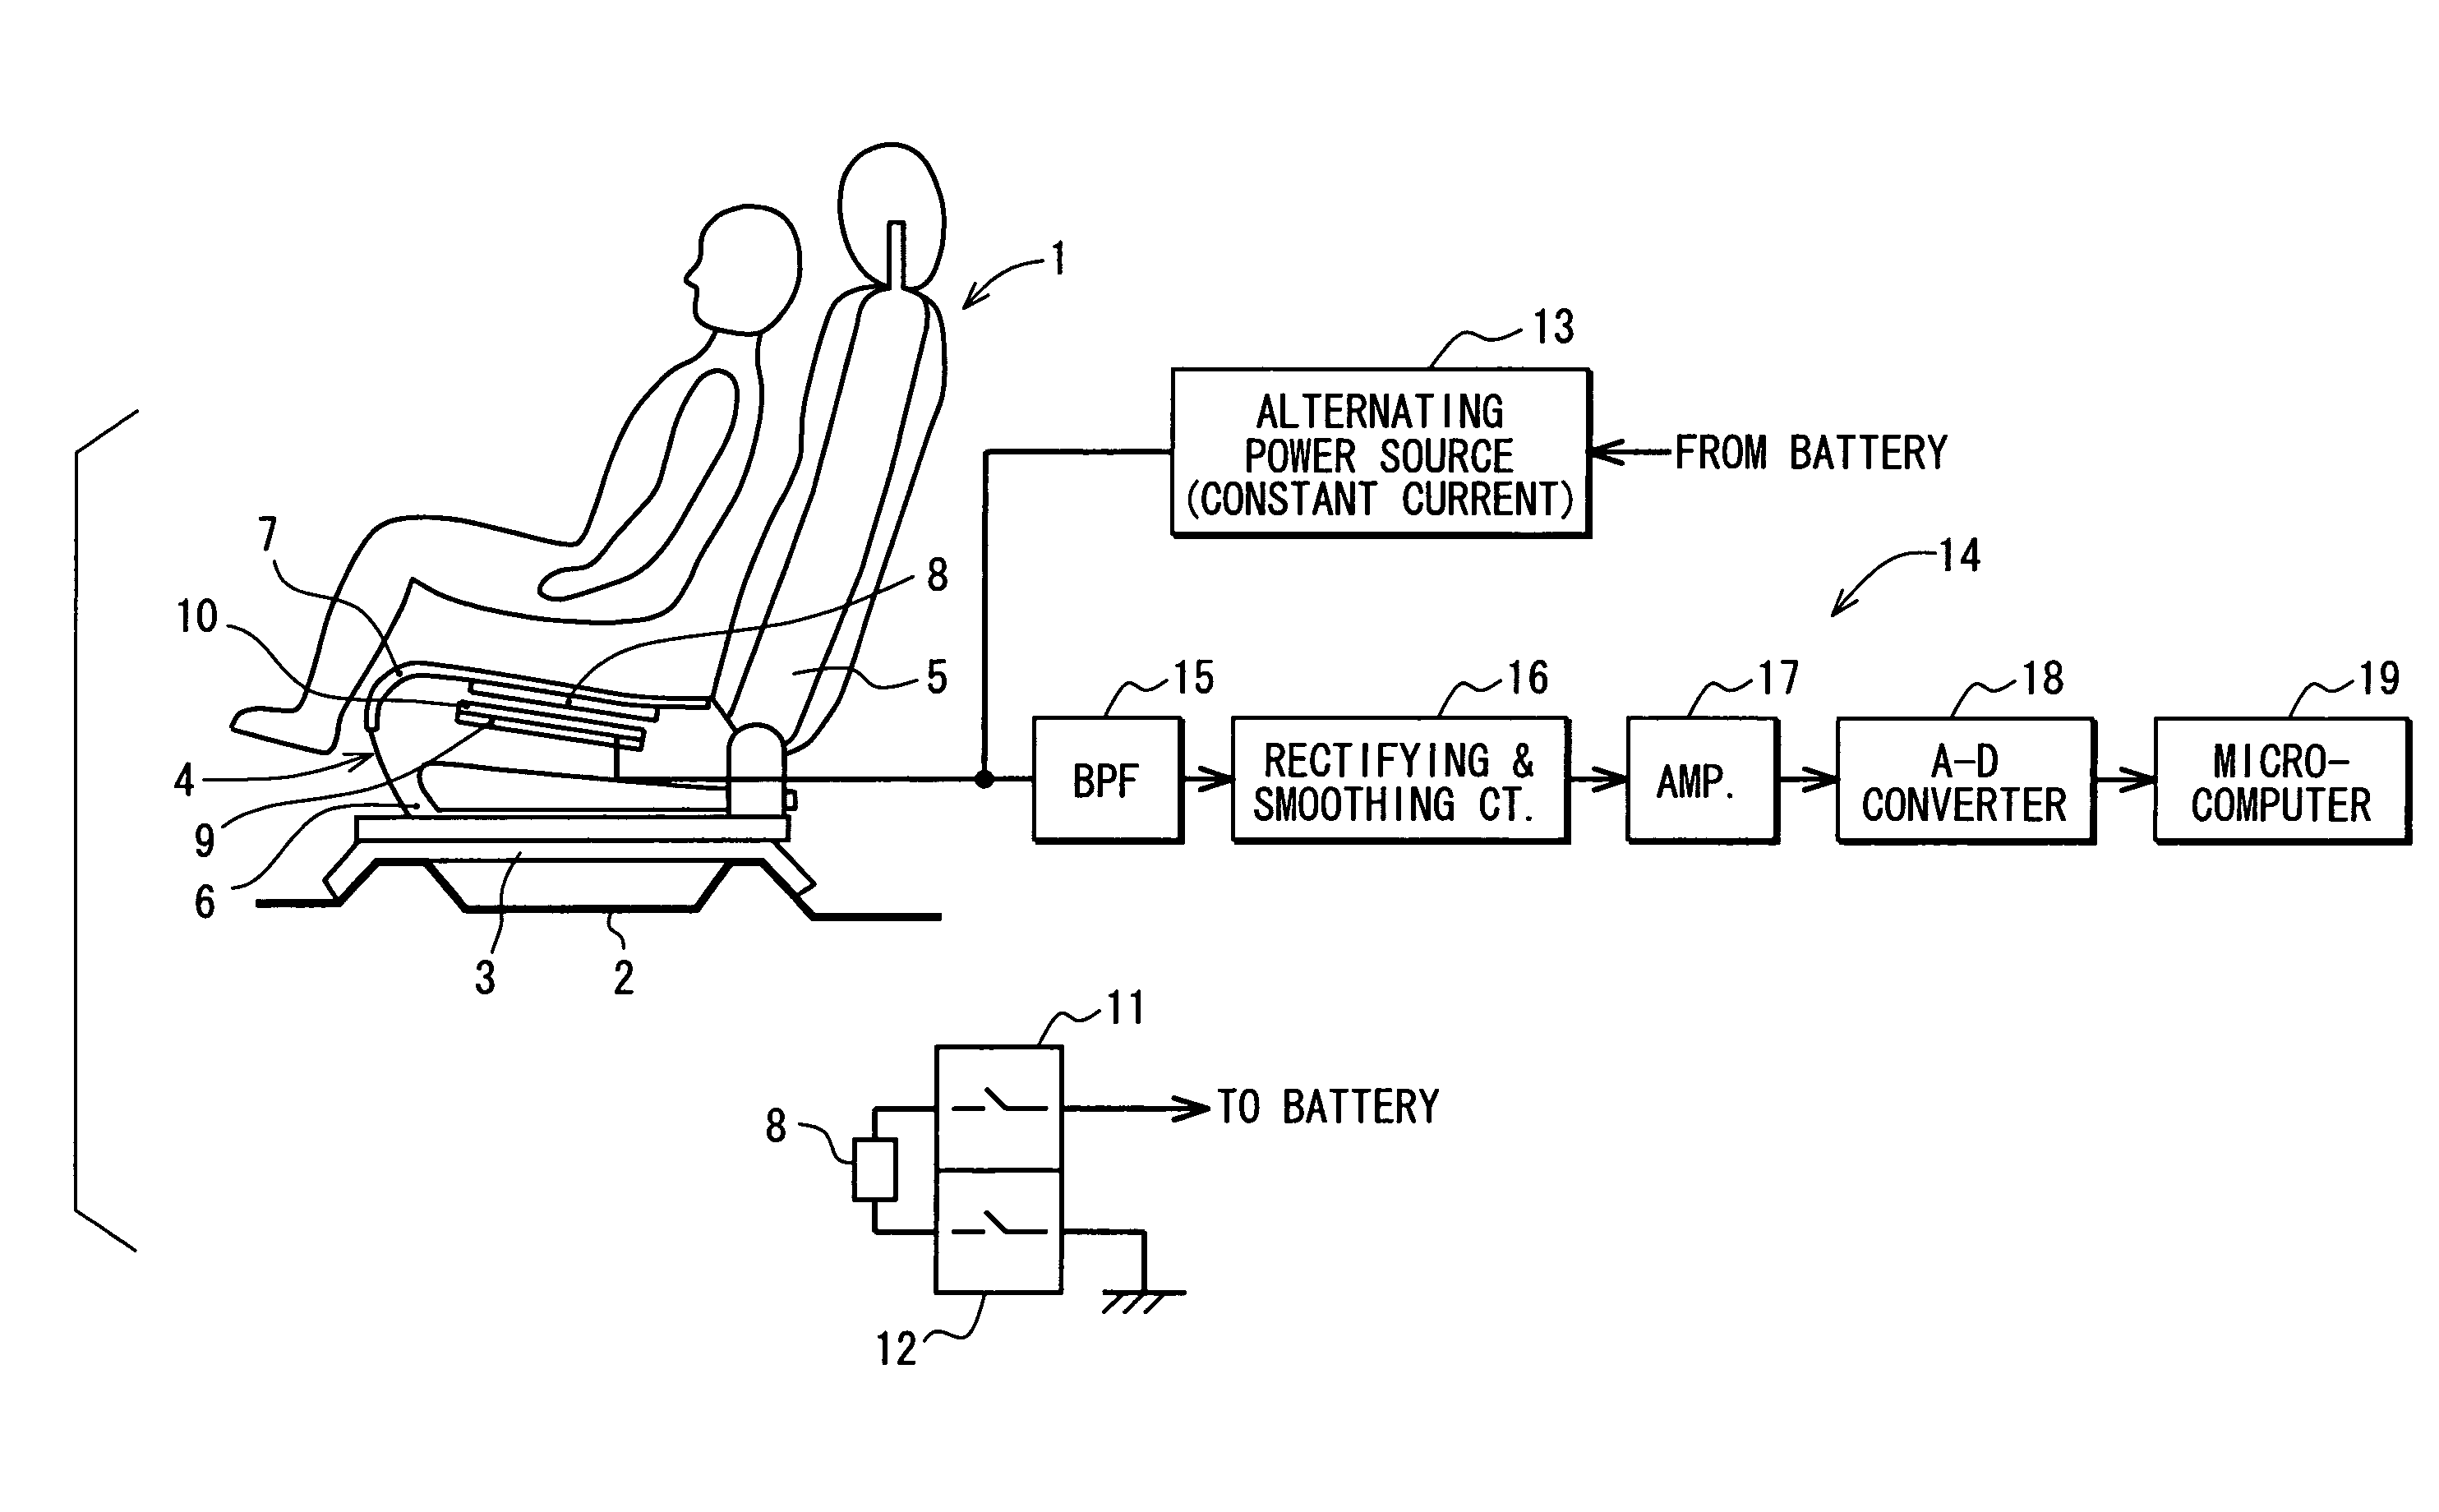 Mazda Occupancy Sensor Schematics Circuit And Wiring Diagram